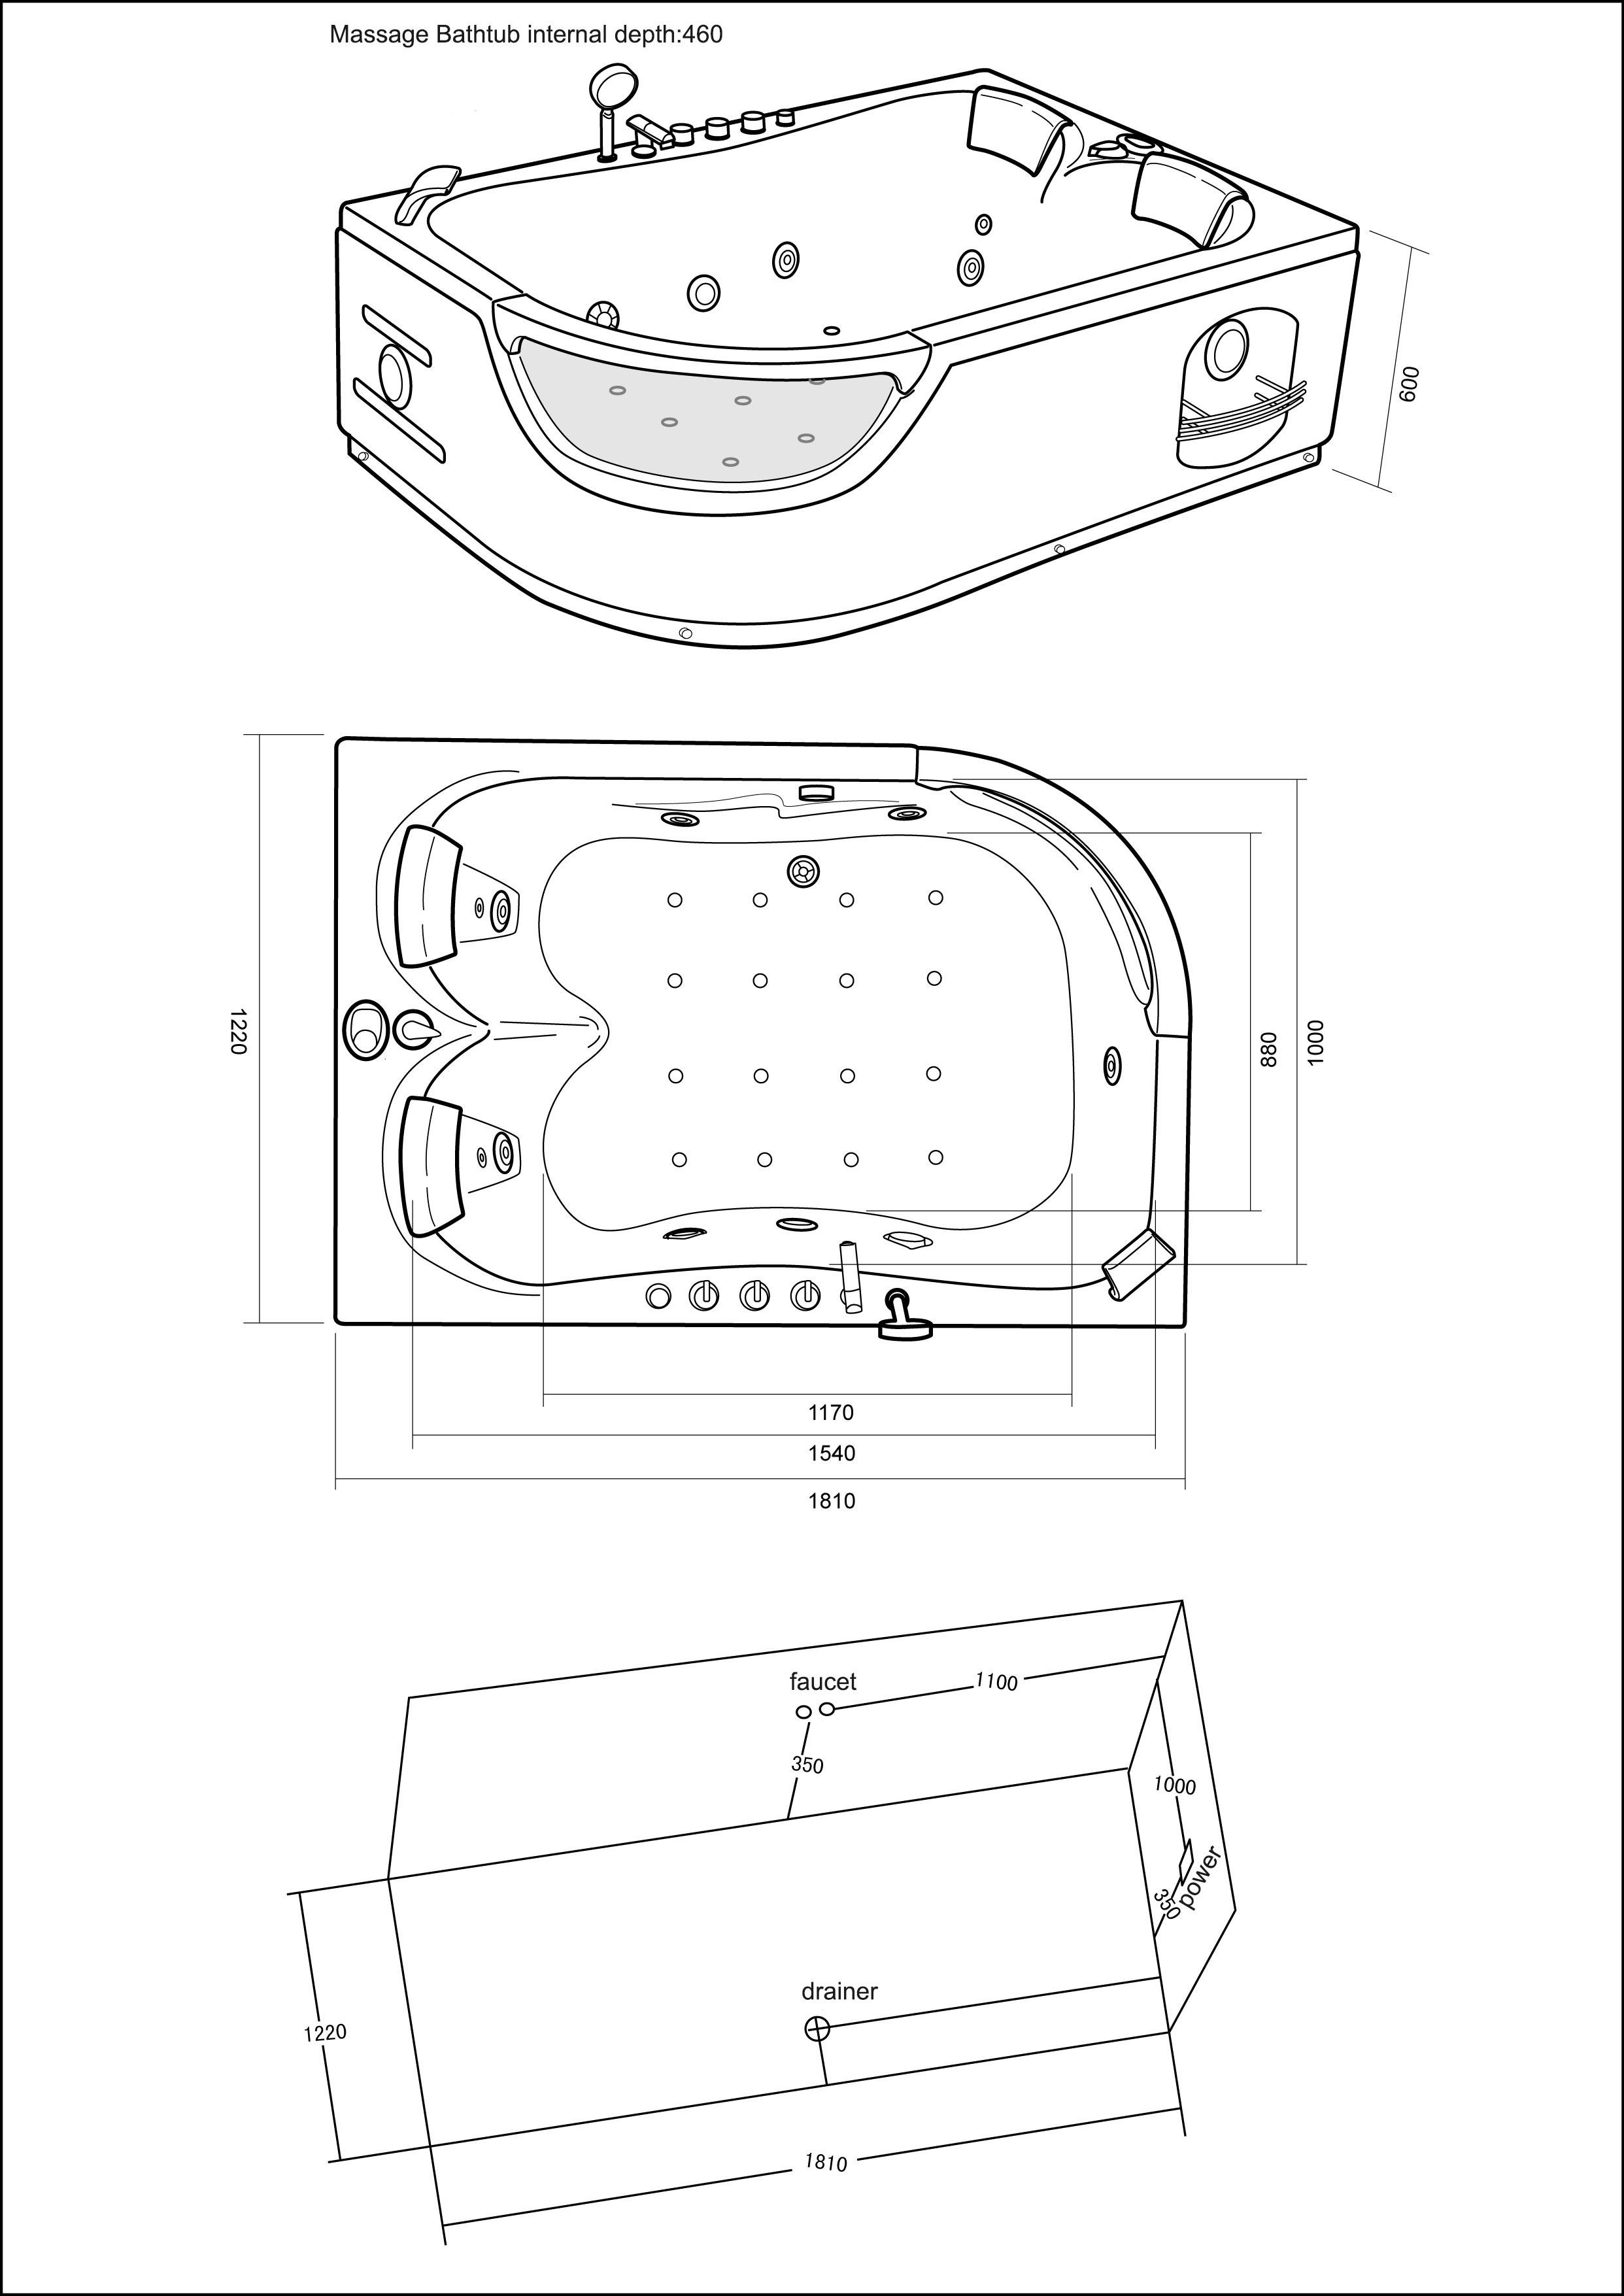 whirlpool corner bath jacuzzi spa 180 x 120 cm hot tub bathtub mod elite